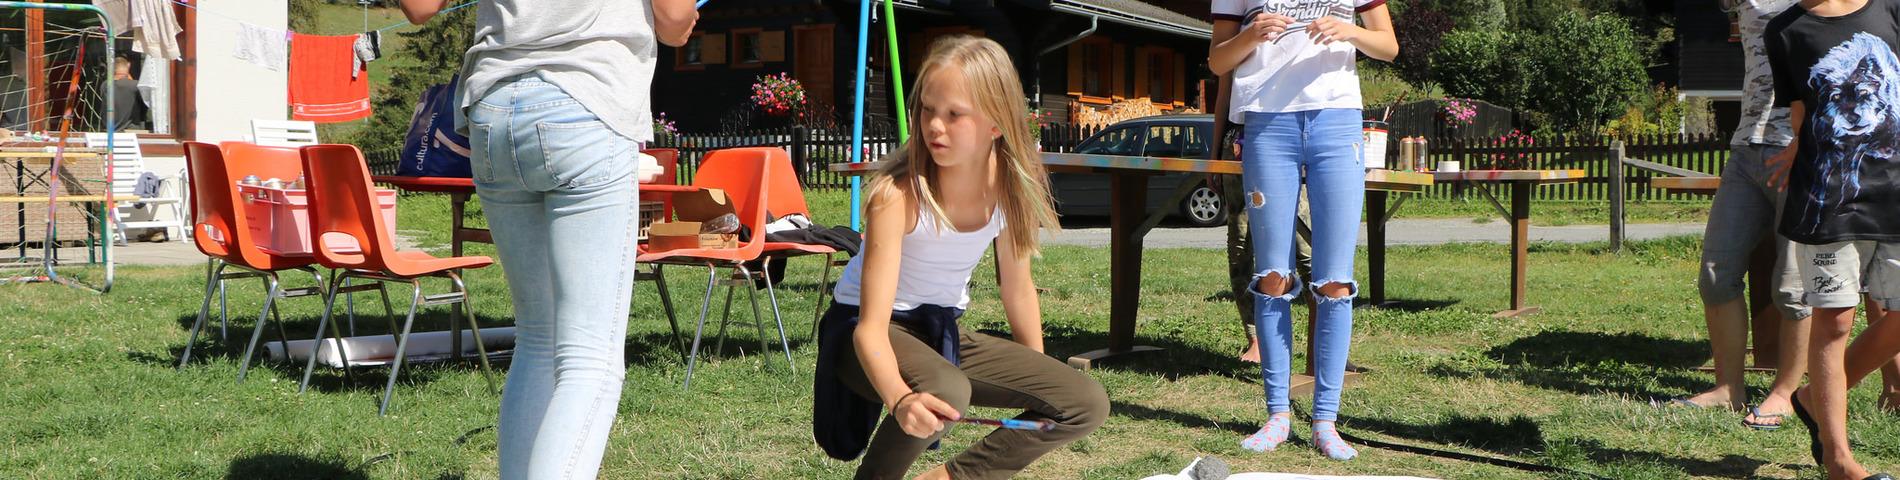 friLingue Language Camps resim 1